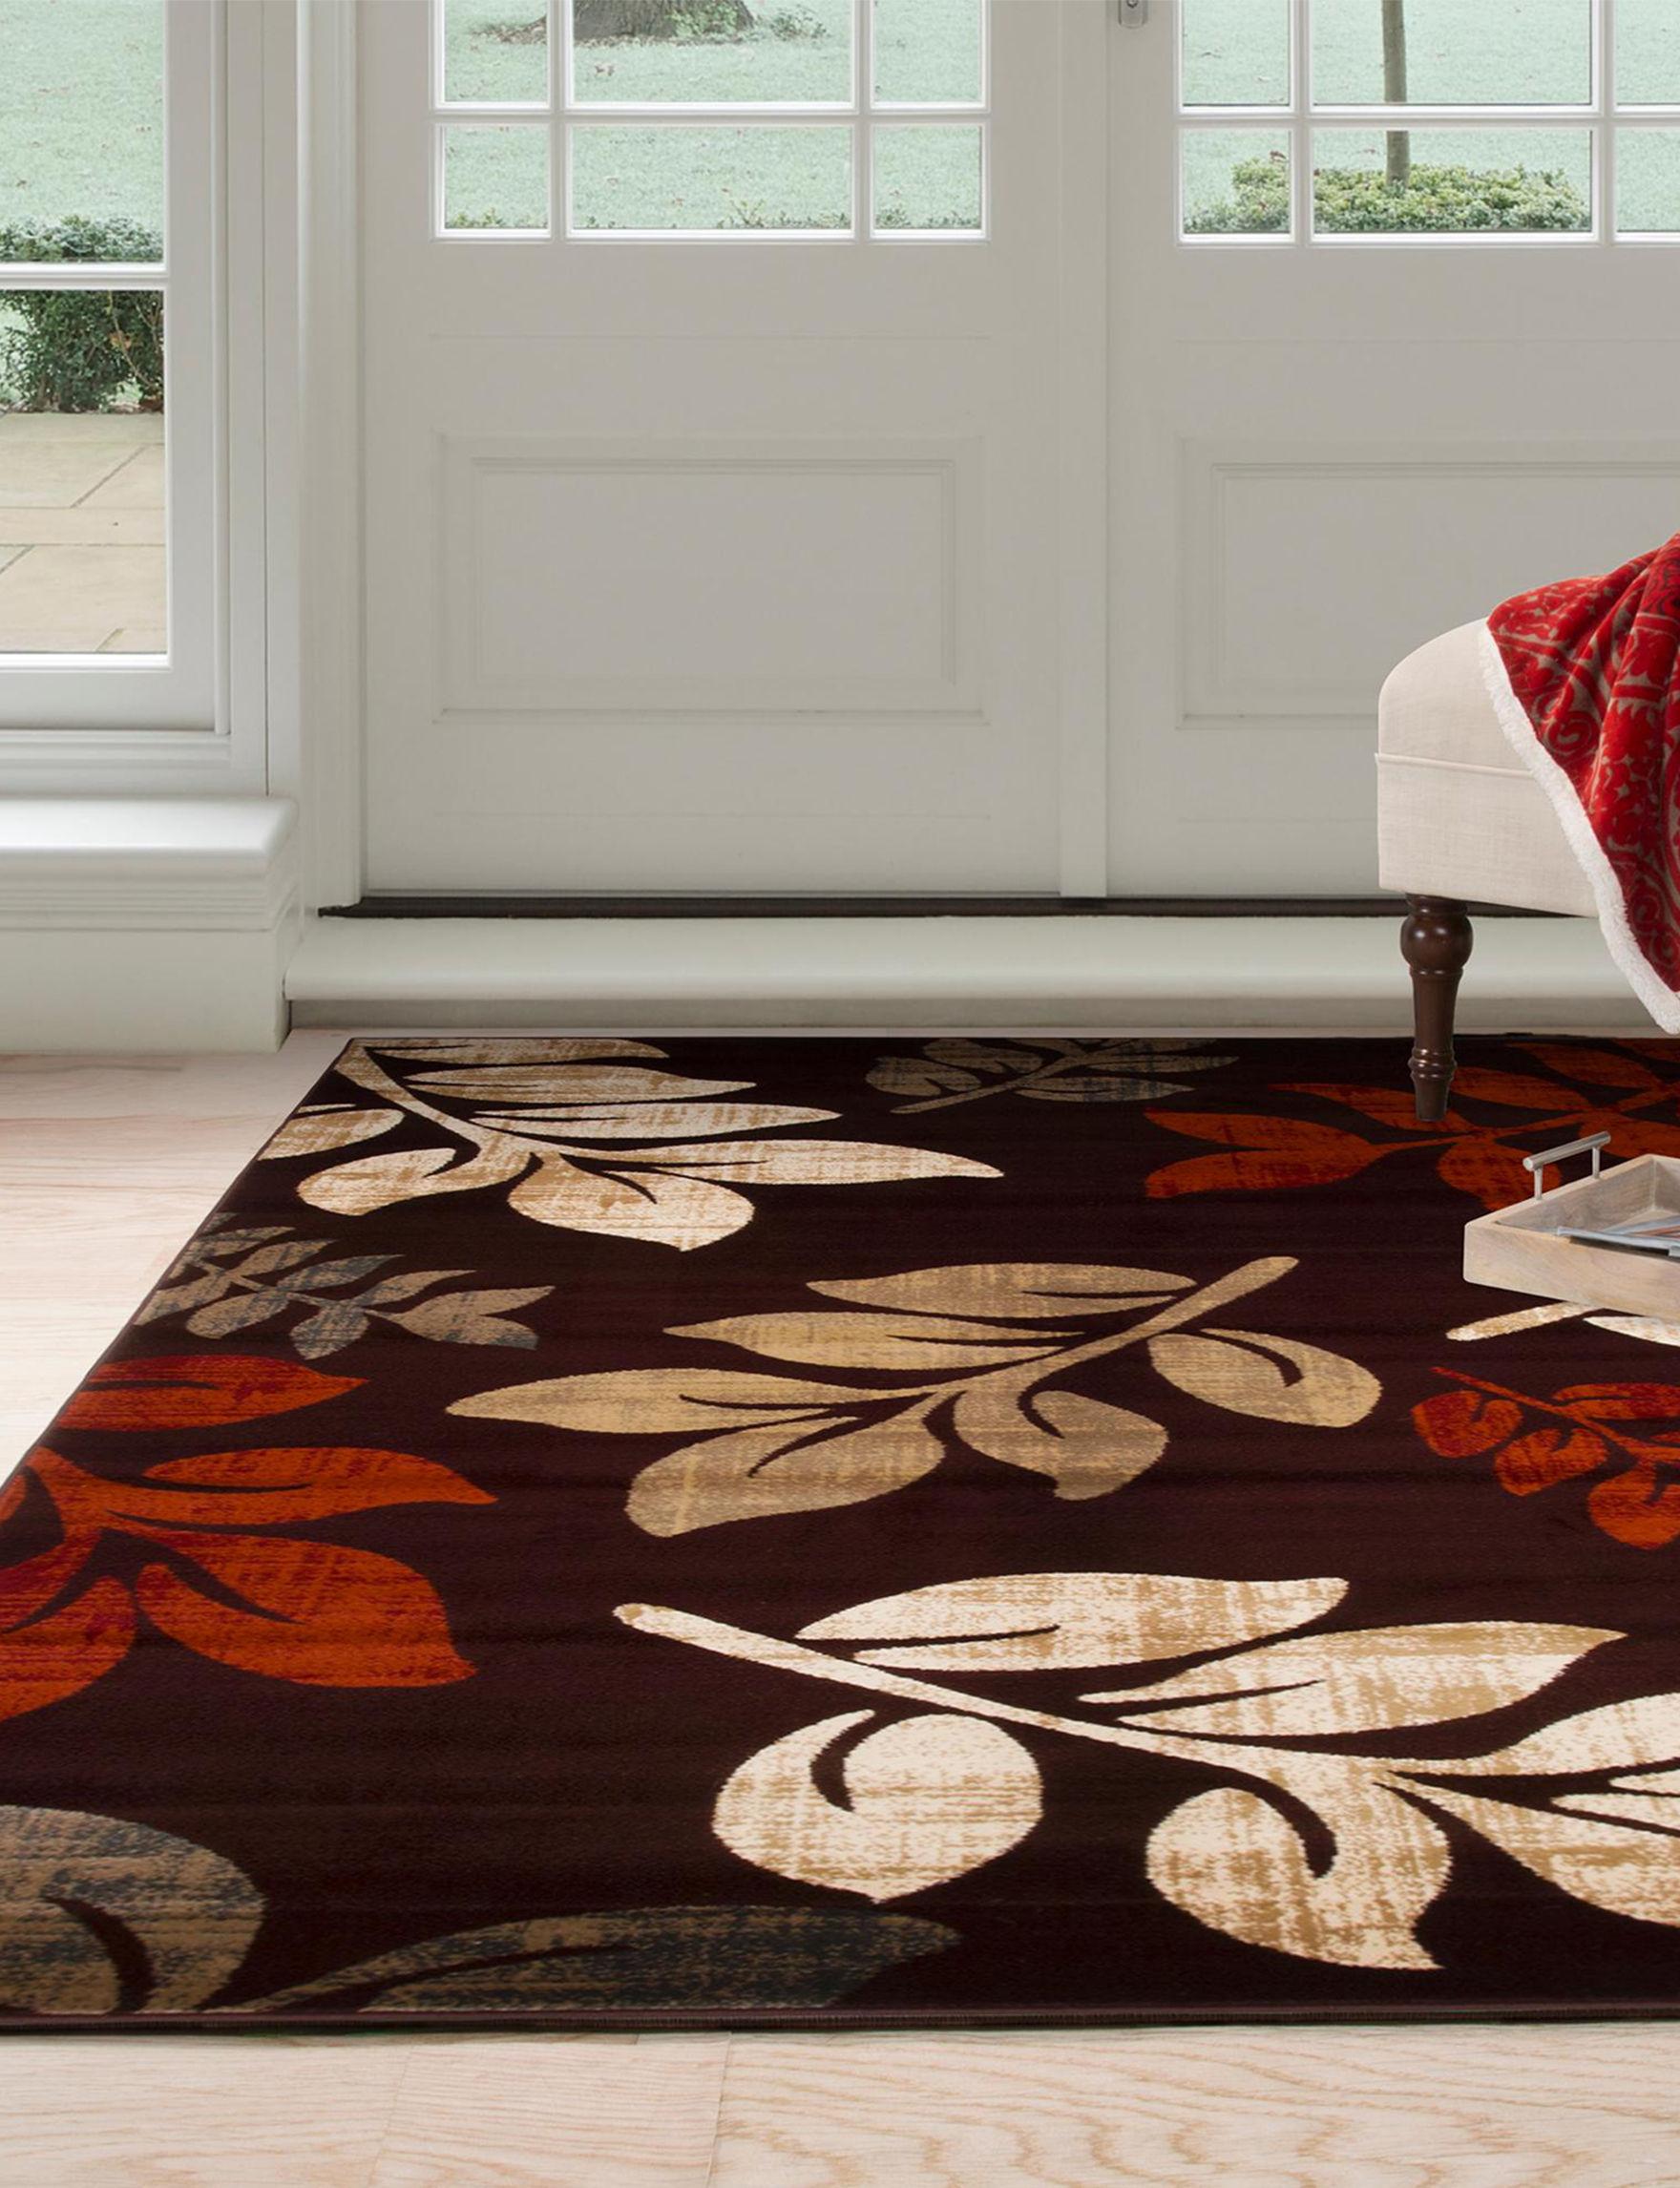 Lavish Home Burgundy/Tan Area Rugs Rugs